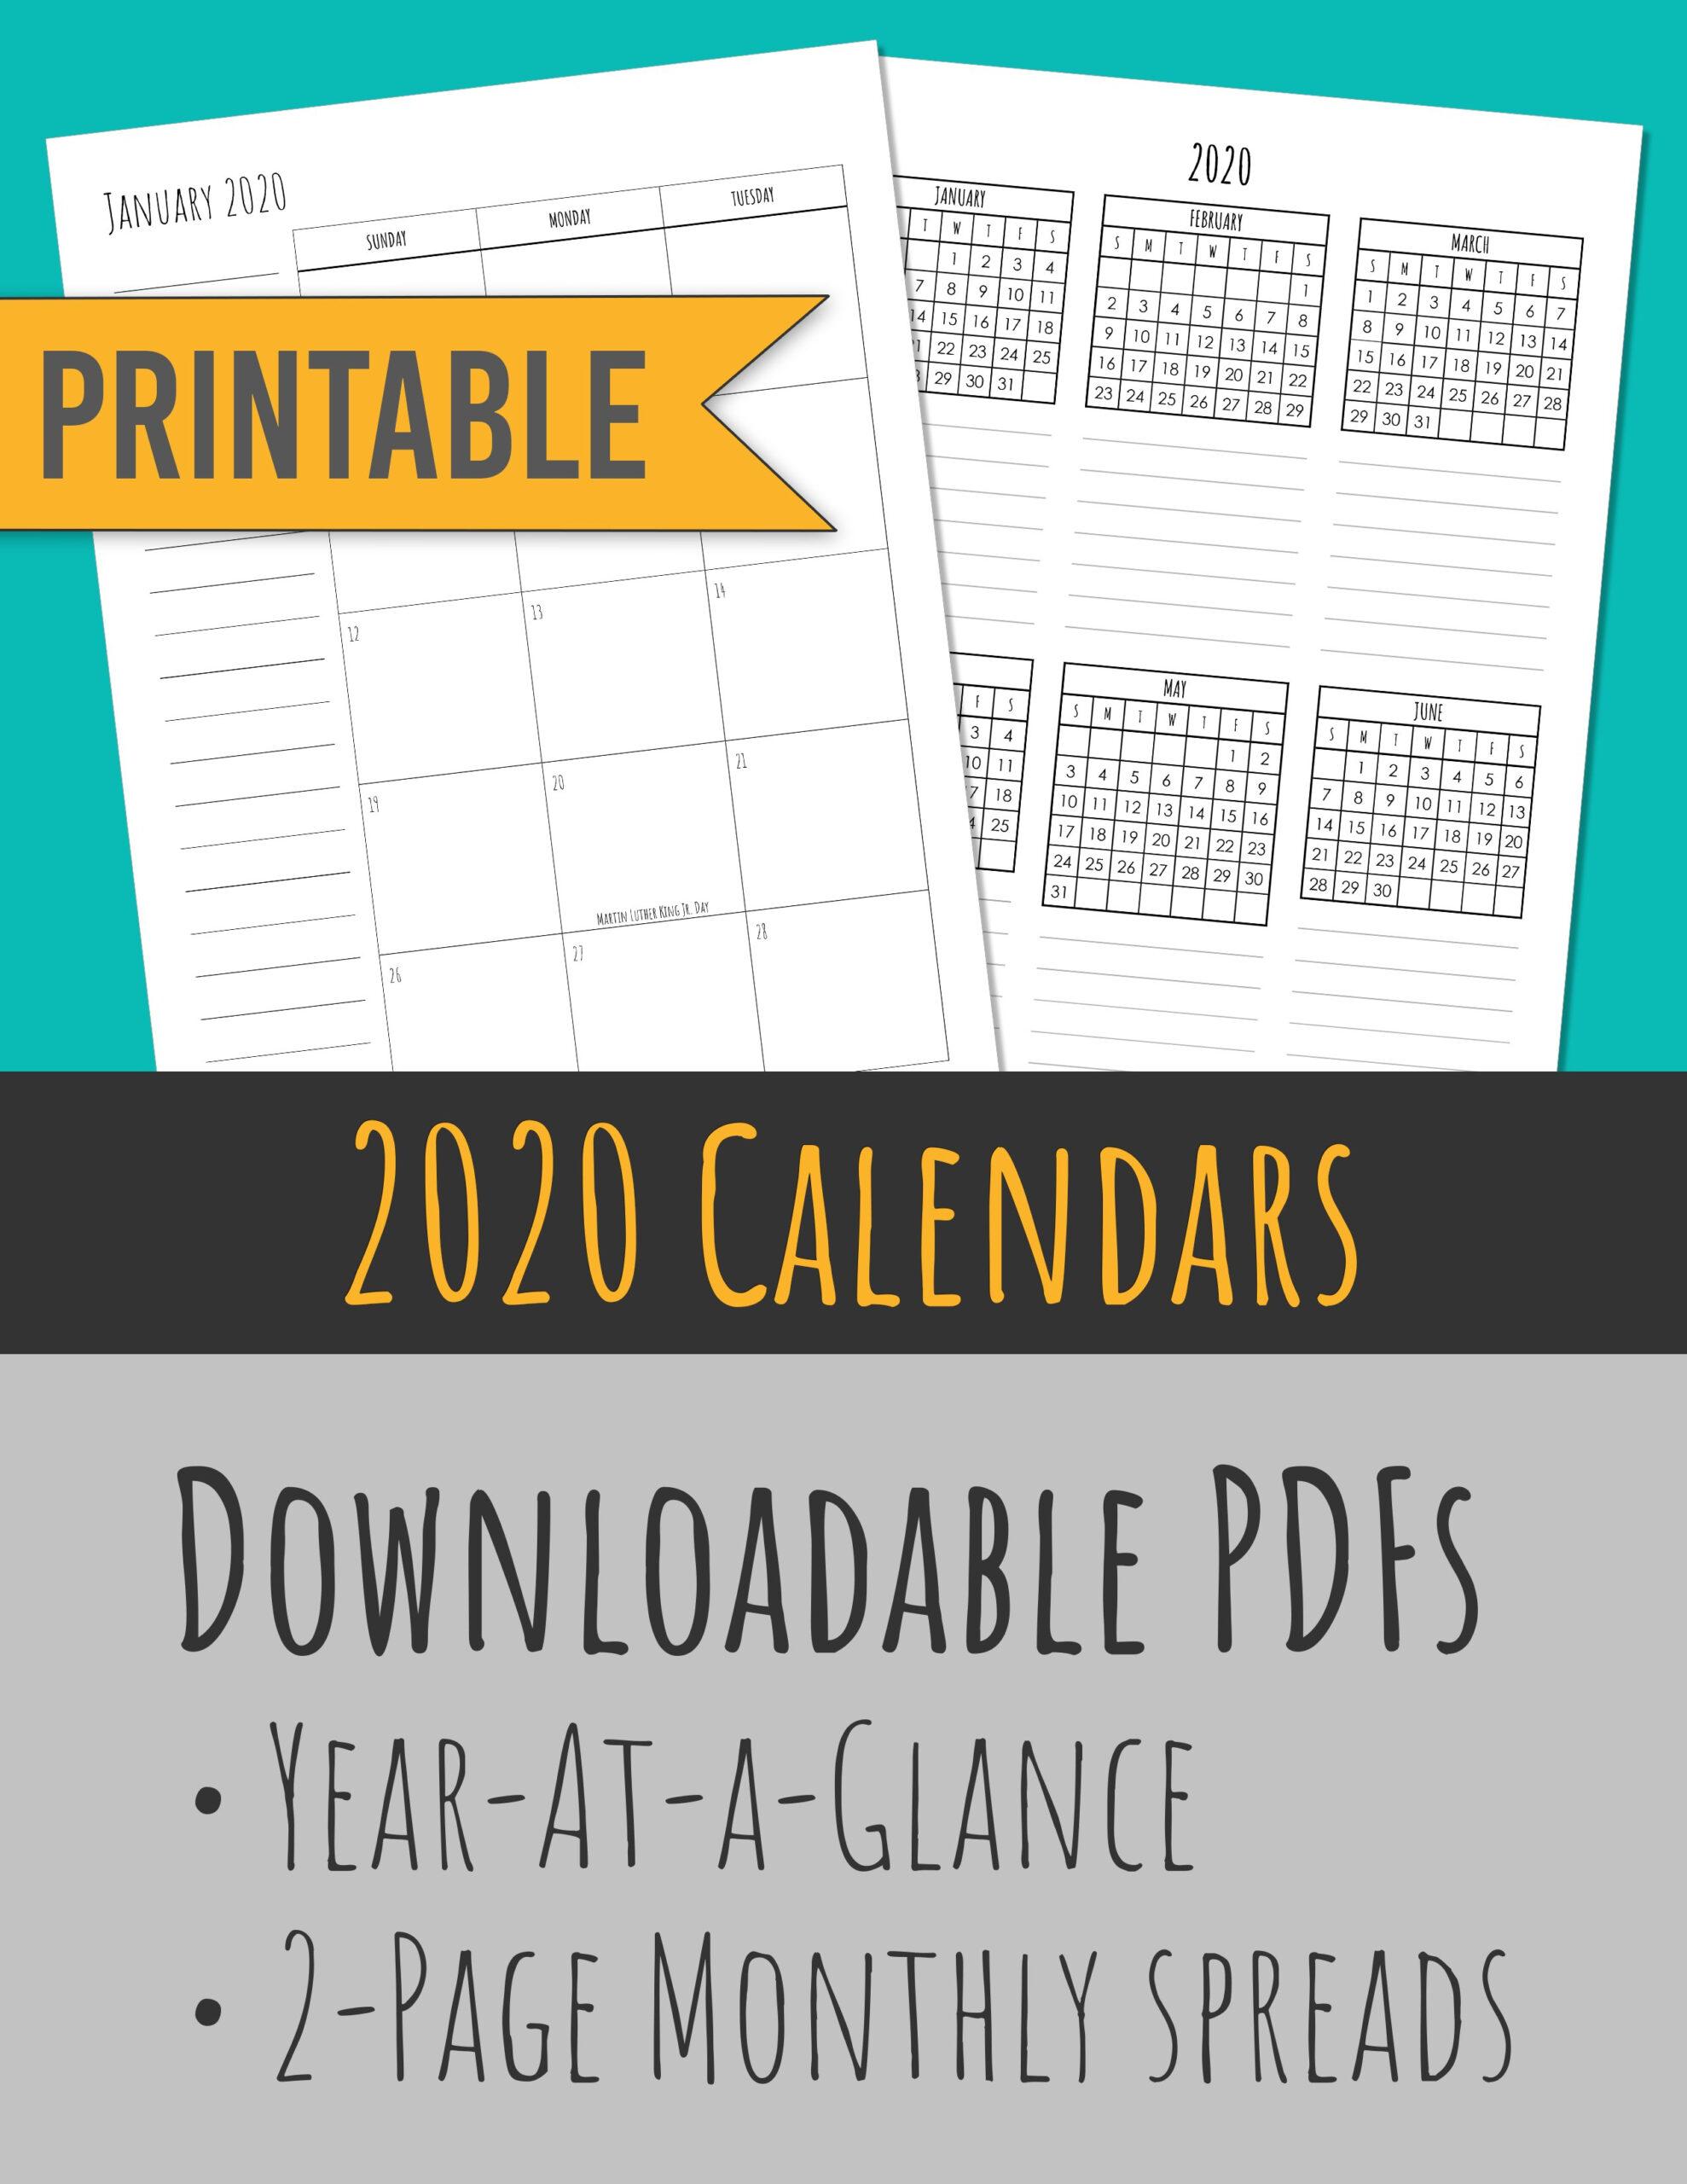 Calendar 2020 Year At A Glance   Calendar Printables Free regarding Year At A Glance Calendar Template